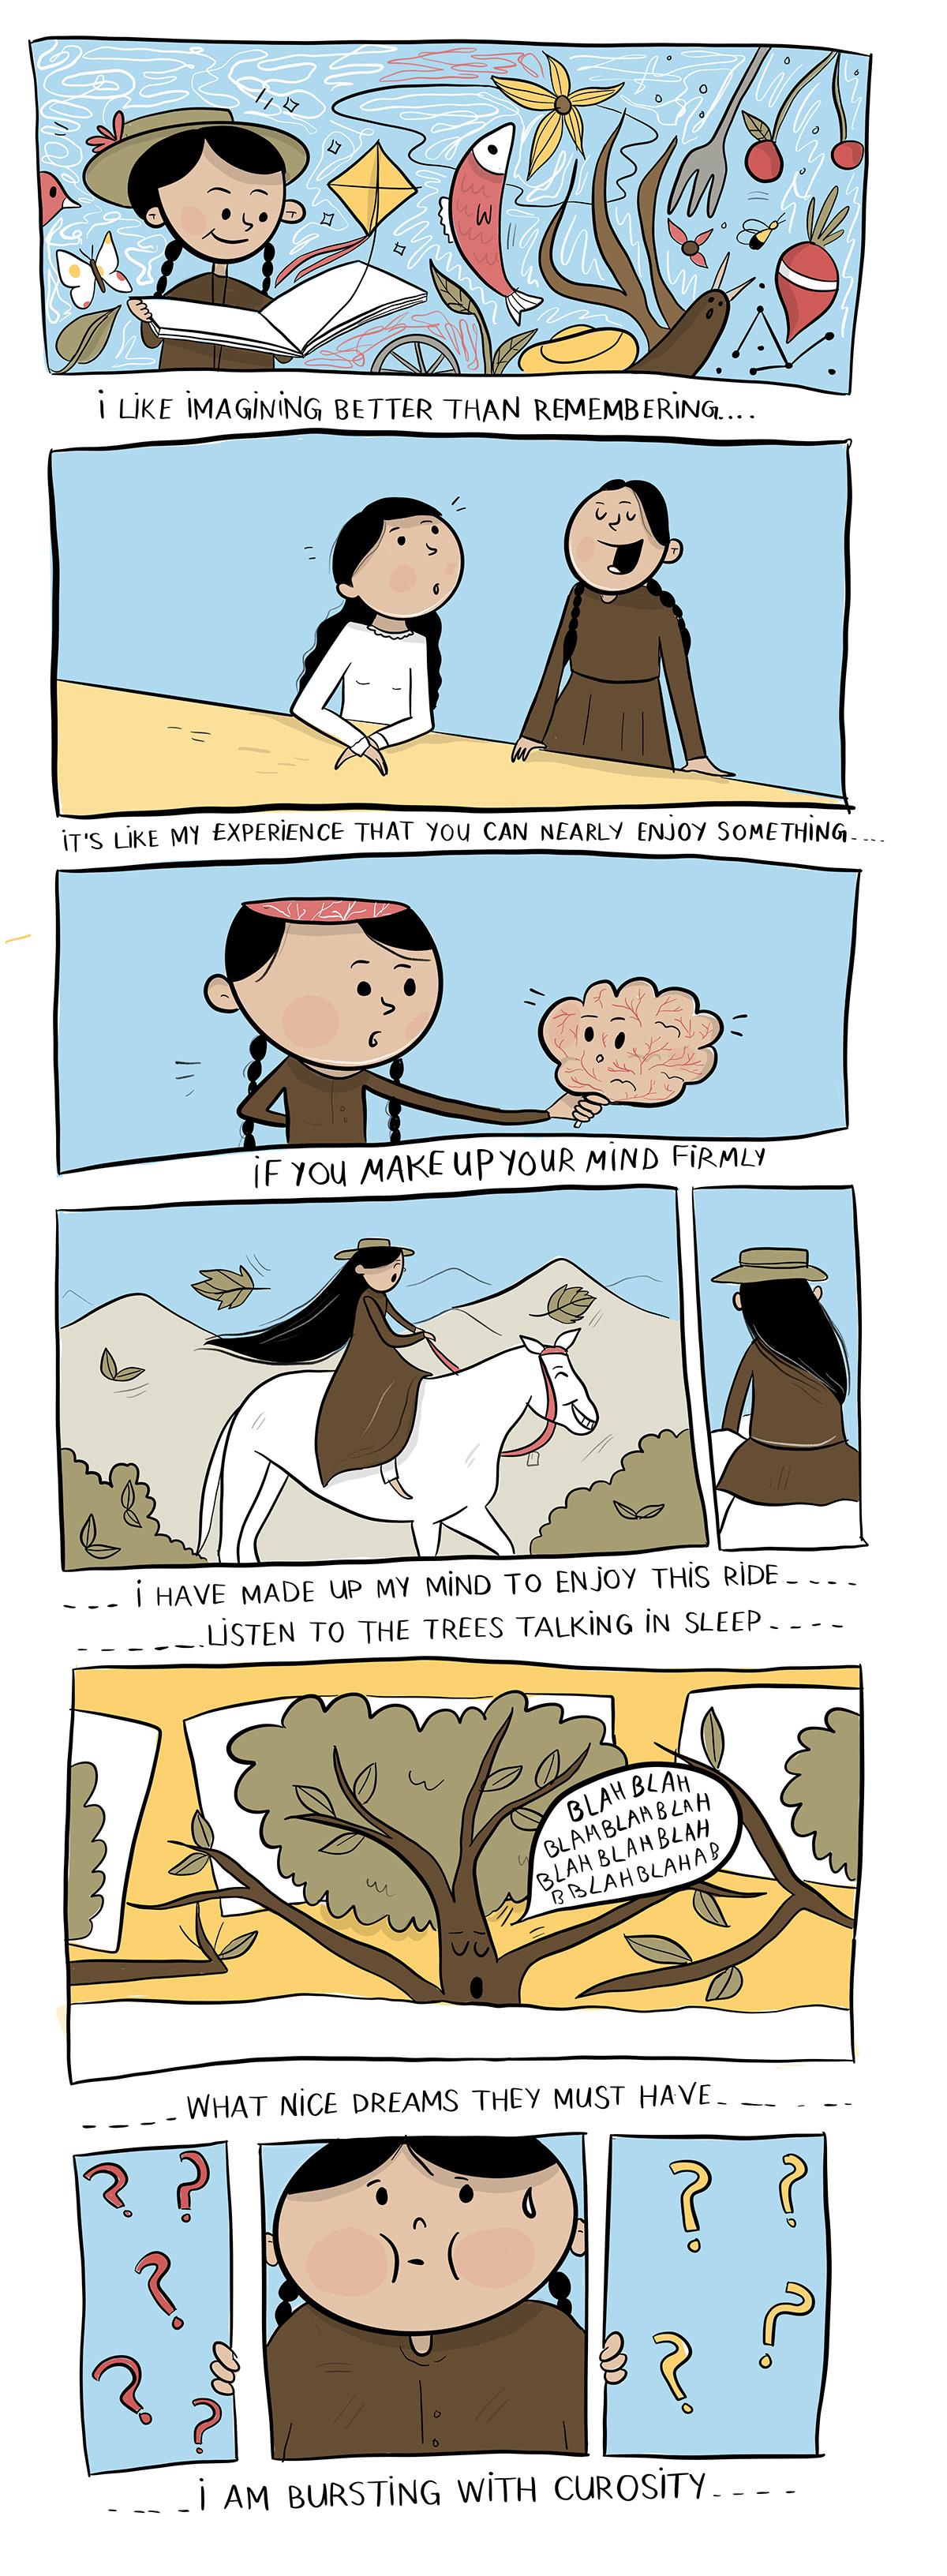 Image may contain: cartoon and comic